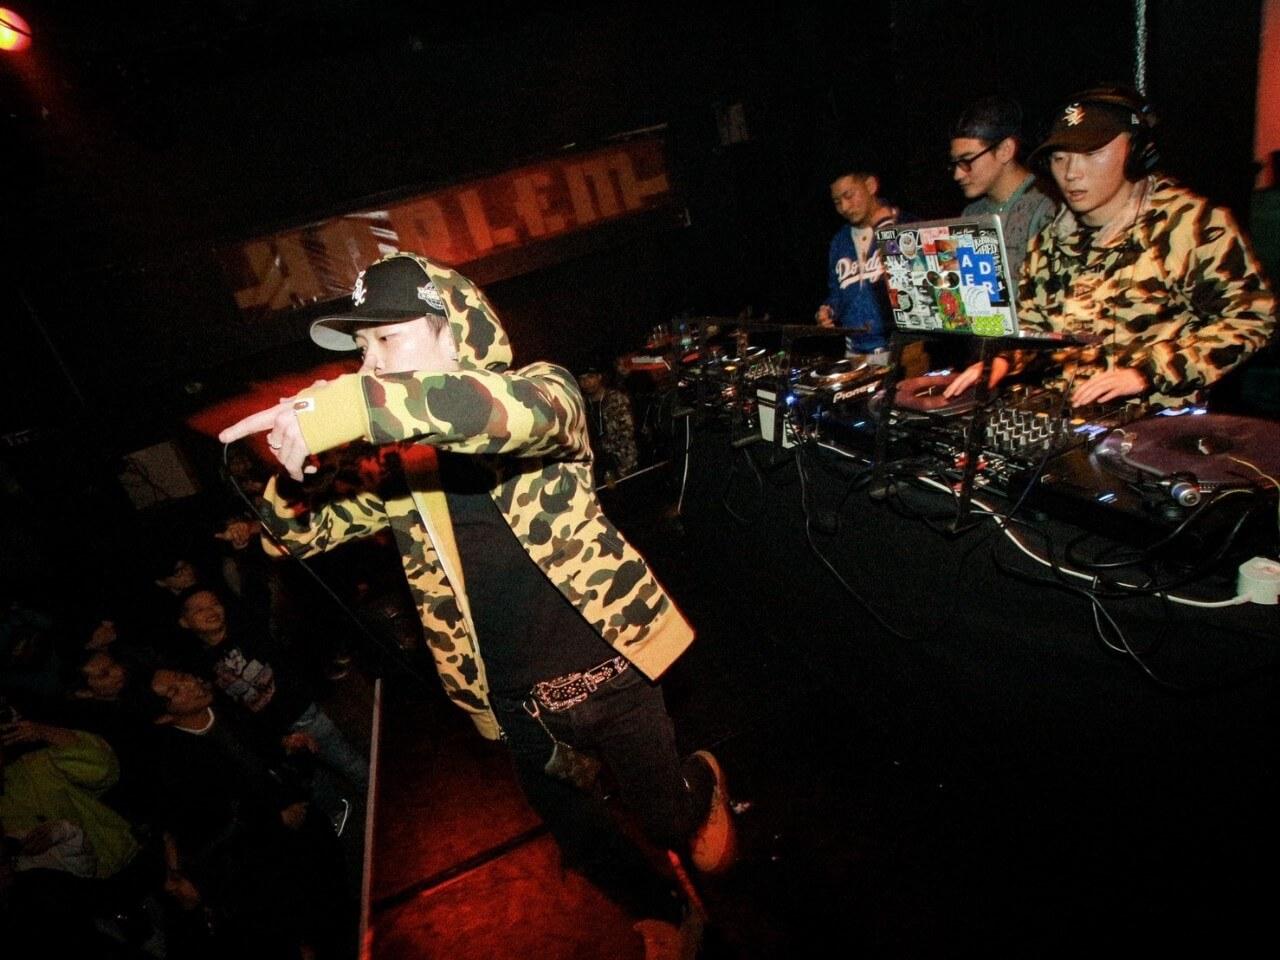 『New Knowledge mixtape 2020』 Mix by DJ RyuNosuK & Goodkid TAKEKI インタビュー